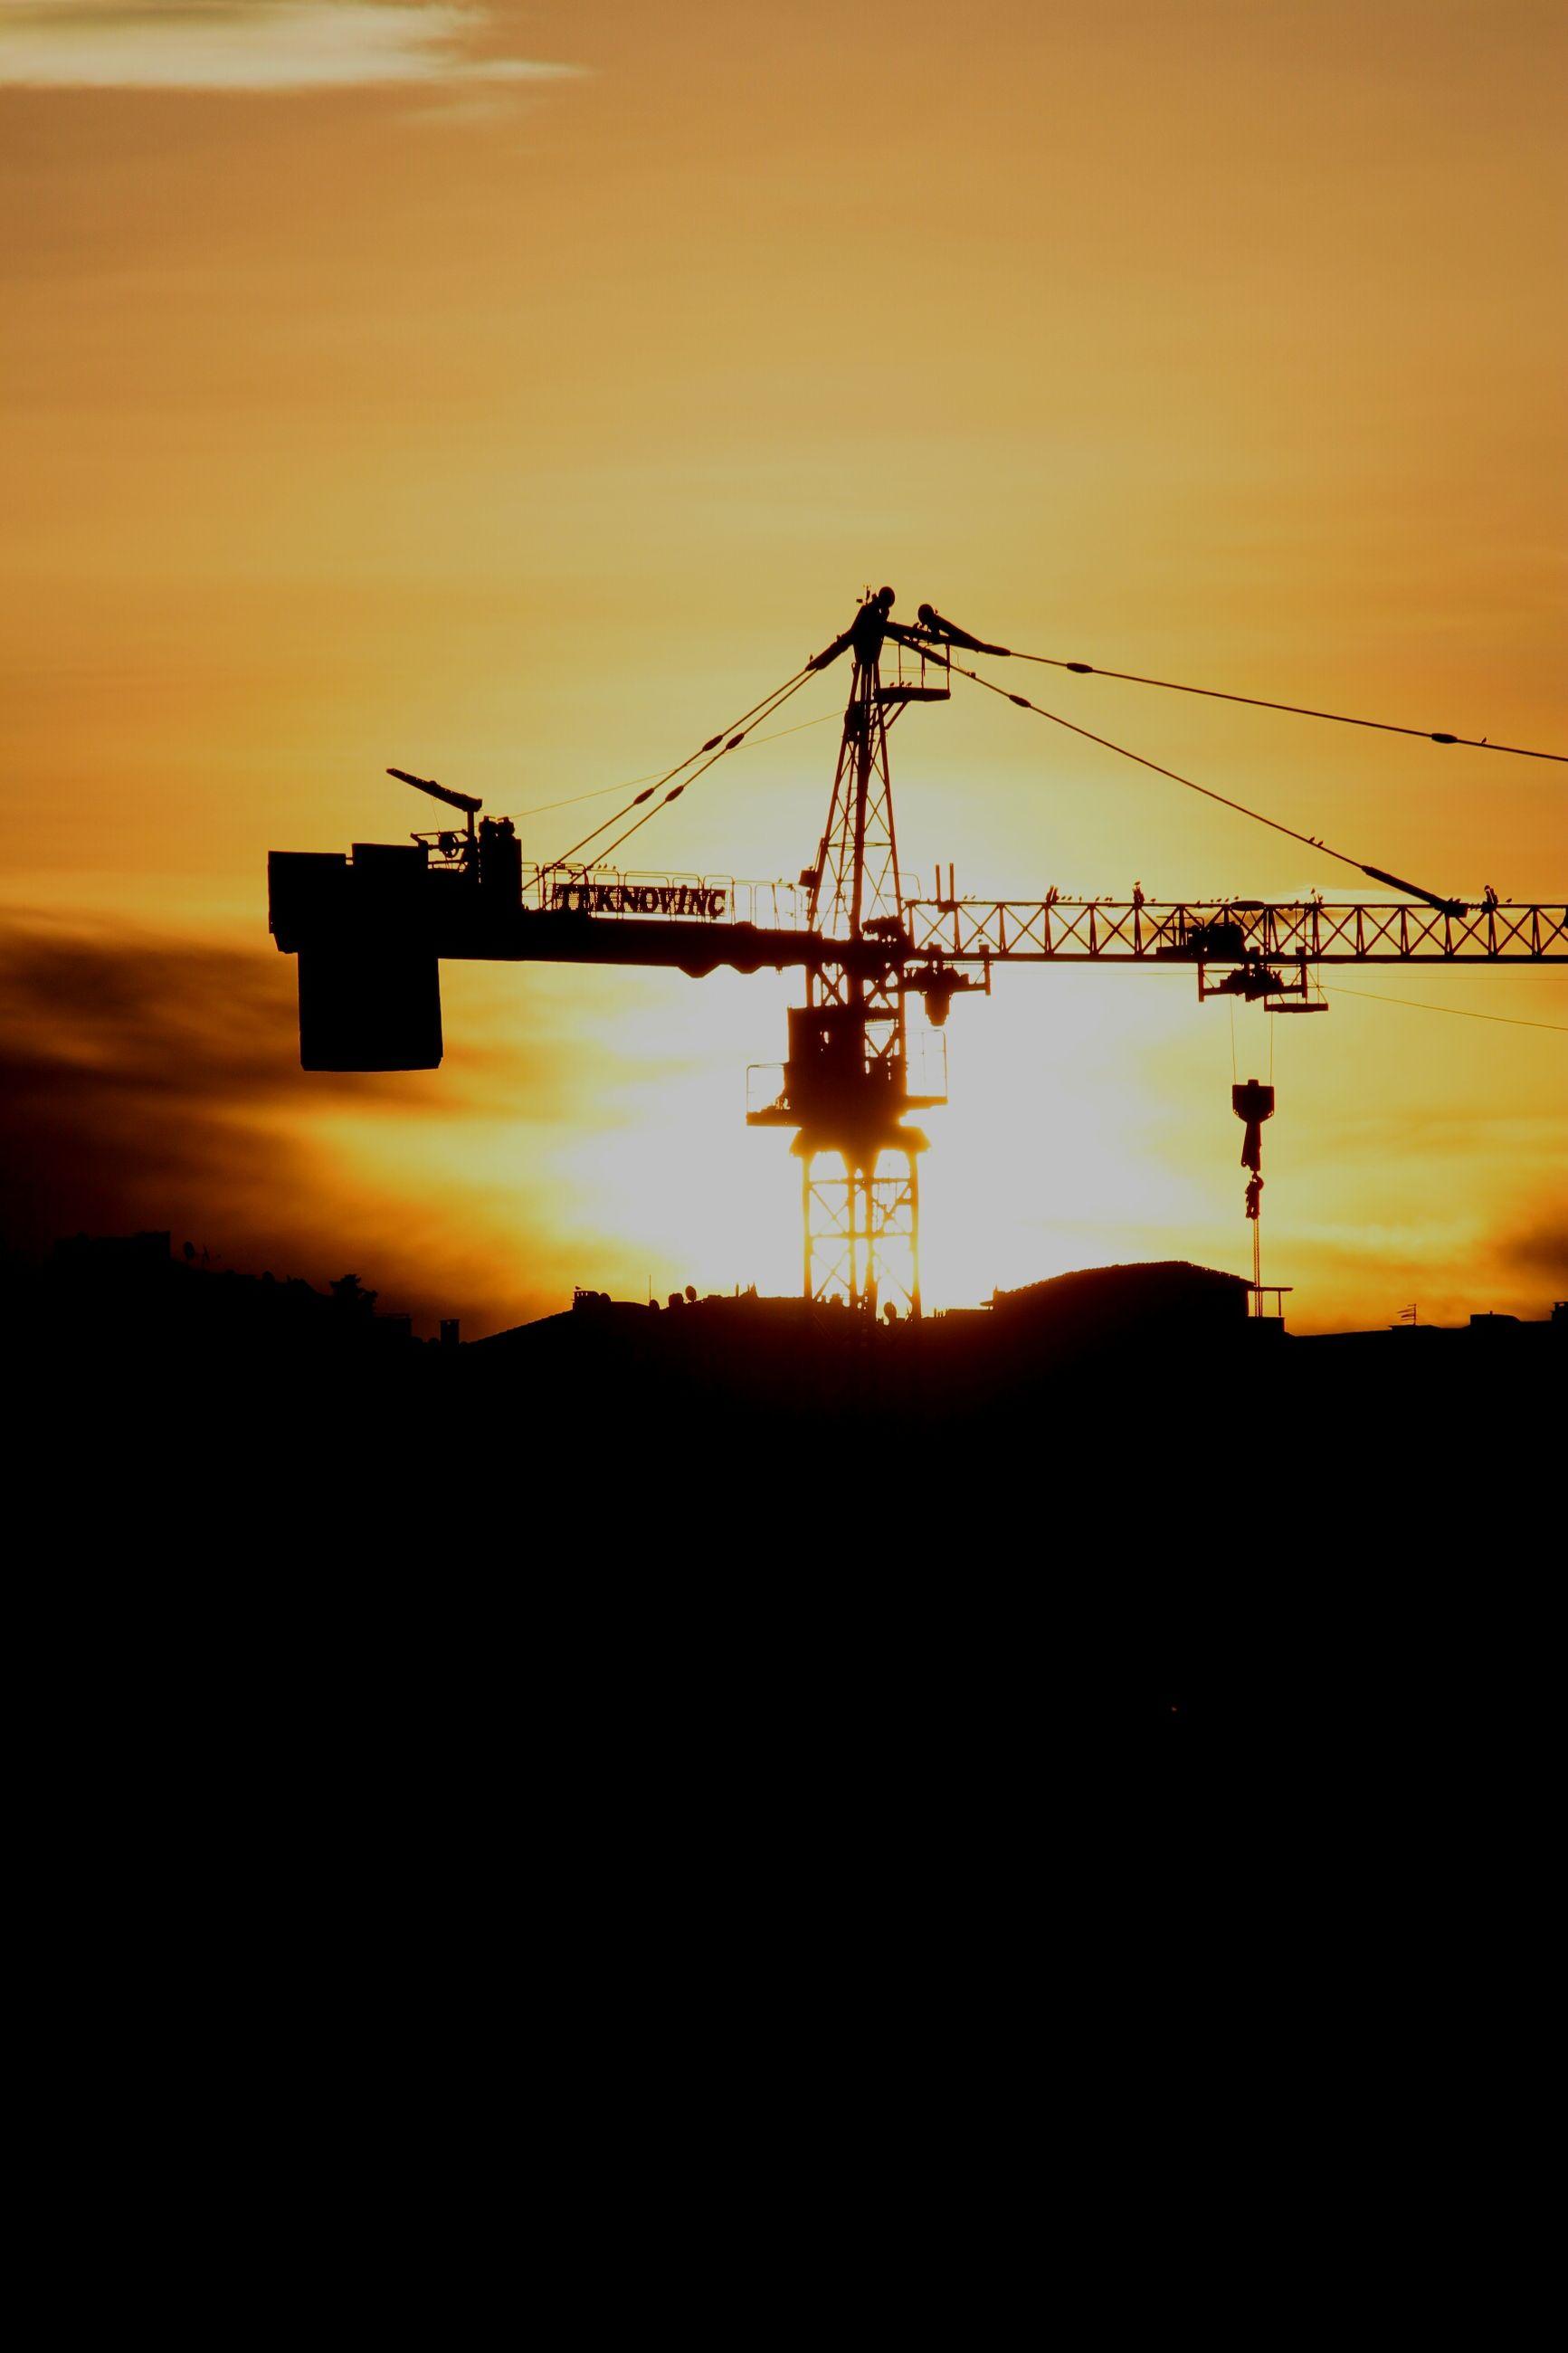 sunset, silhouette, orange color, crane - construction machinery, construction site, industry, sky, crane, sun, built structure, construction, development, beauty in nature, copy space, nature, fuel and power generation, architecture, scenics, dark, outdoors